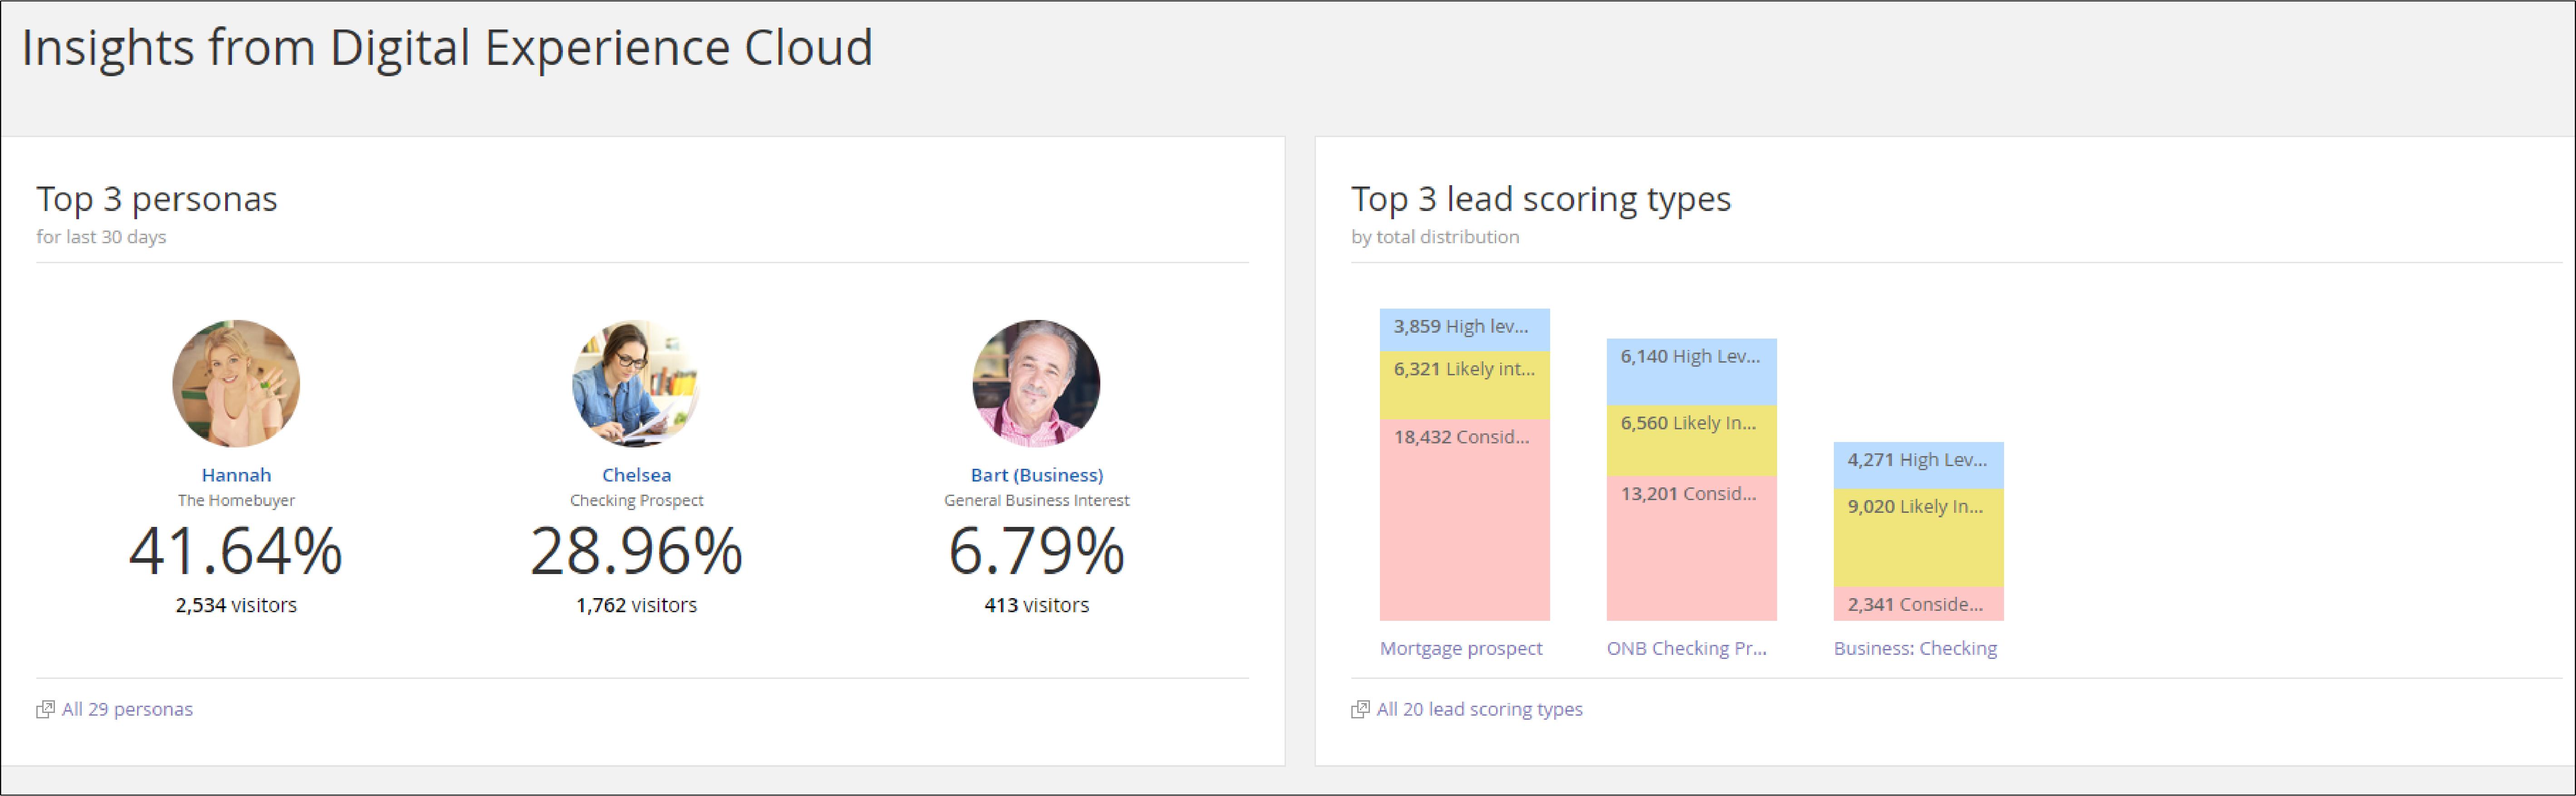 insights from digital experience cloud screenshot